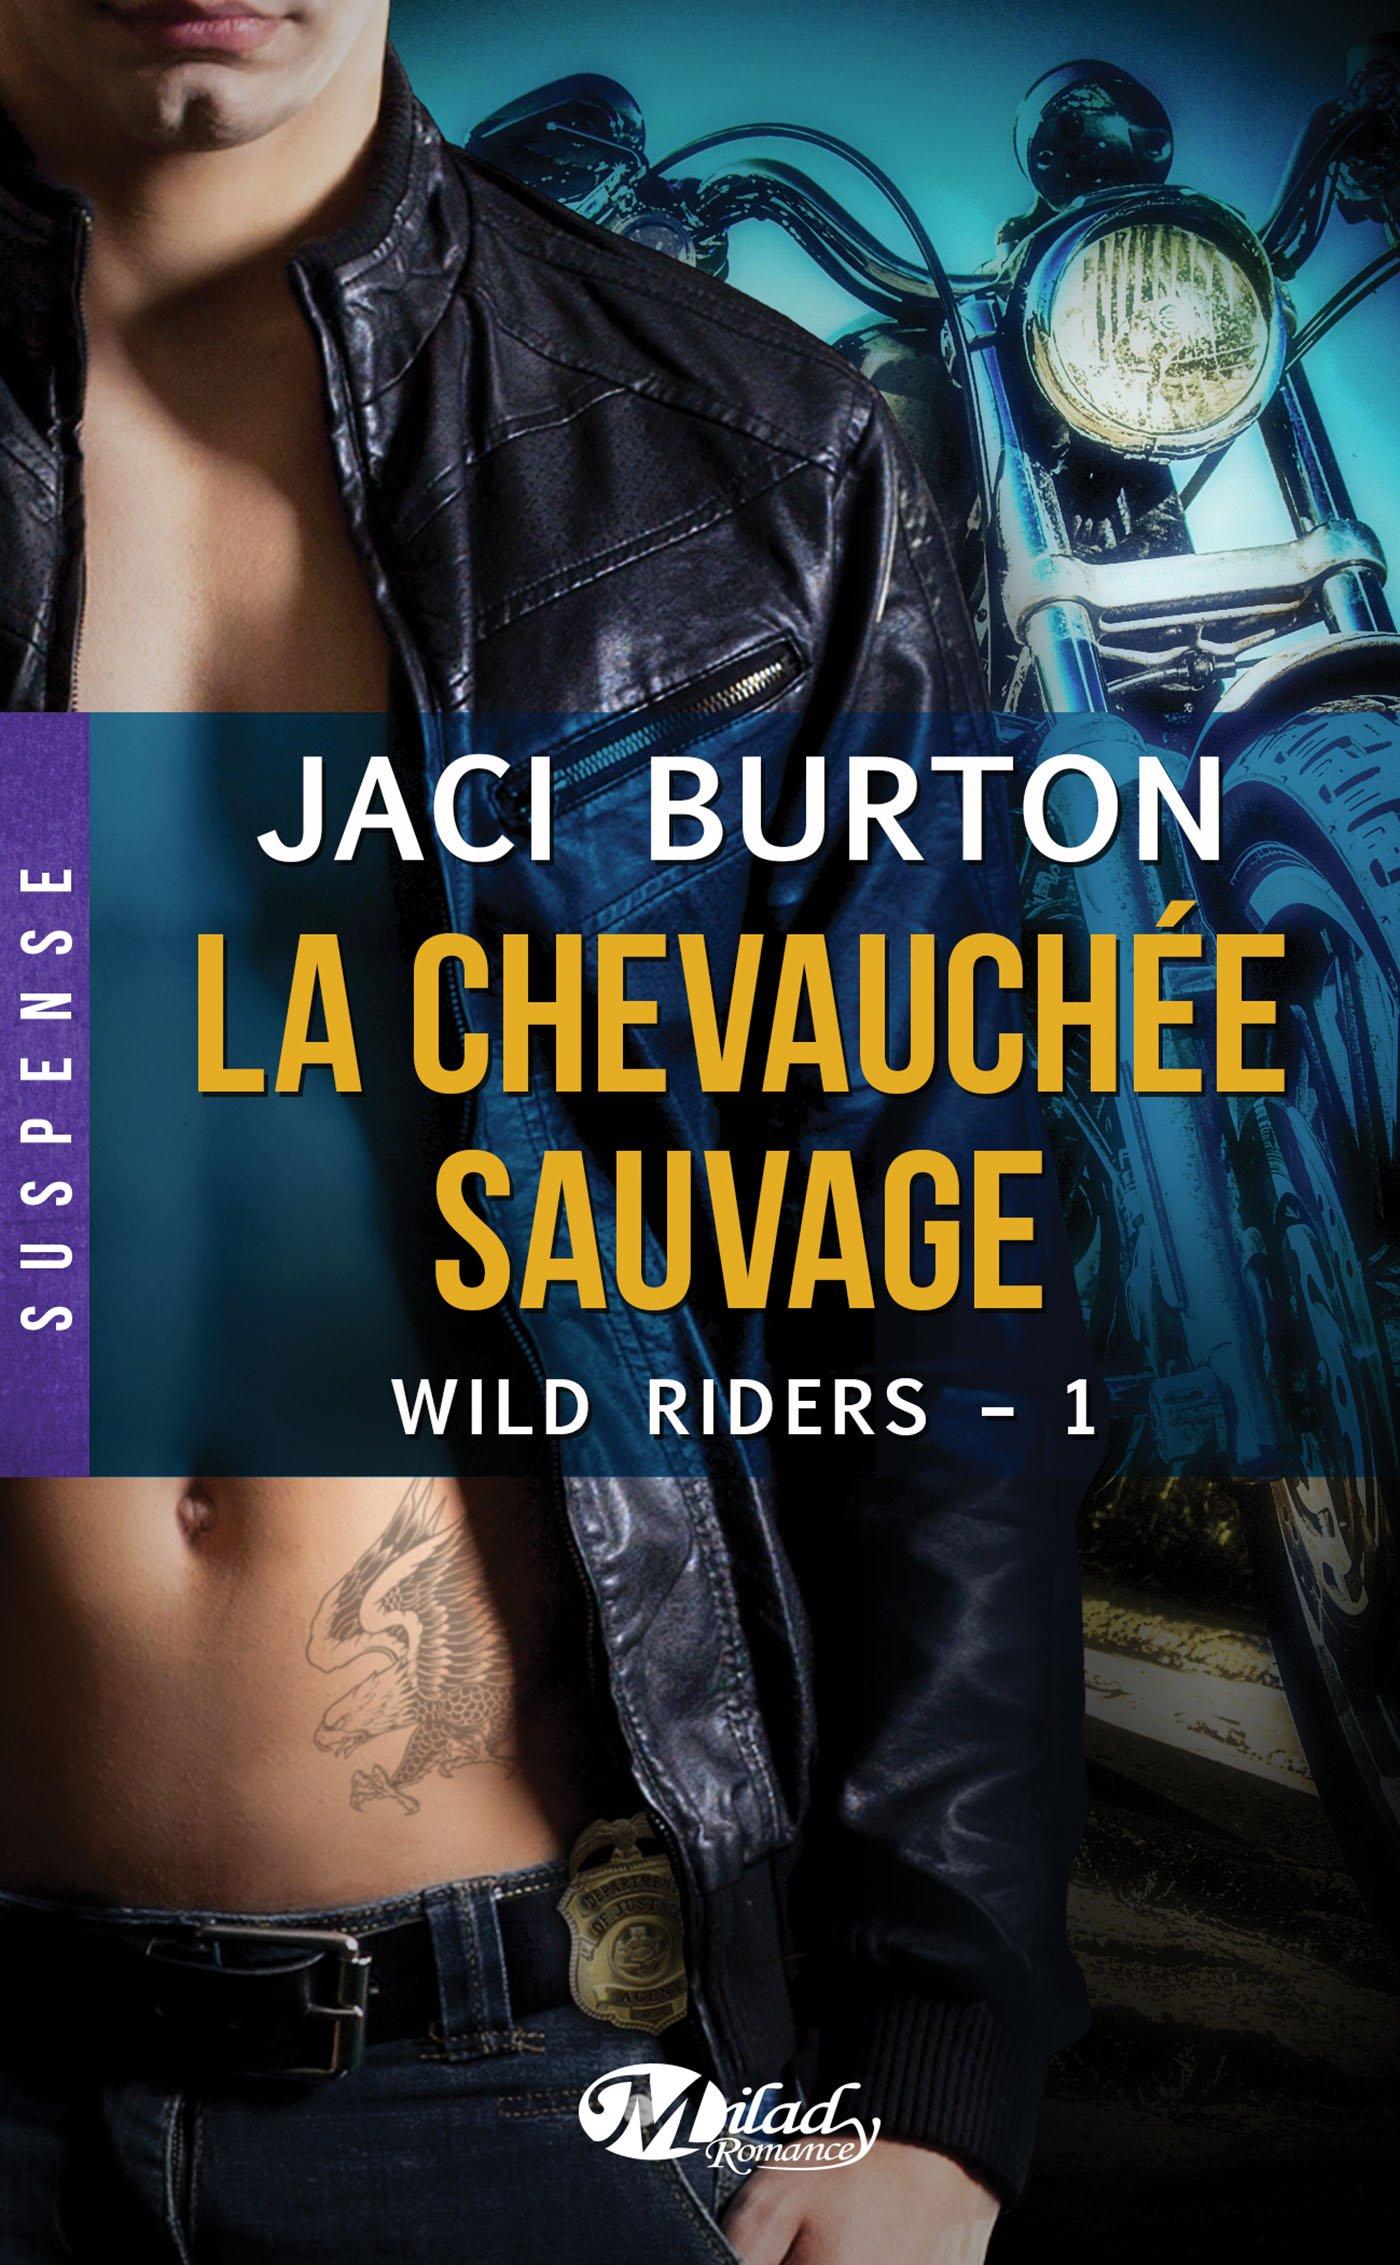 Wild Riders, Tome 1 : La chevauchée sauvage 81A9yNwjfRL